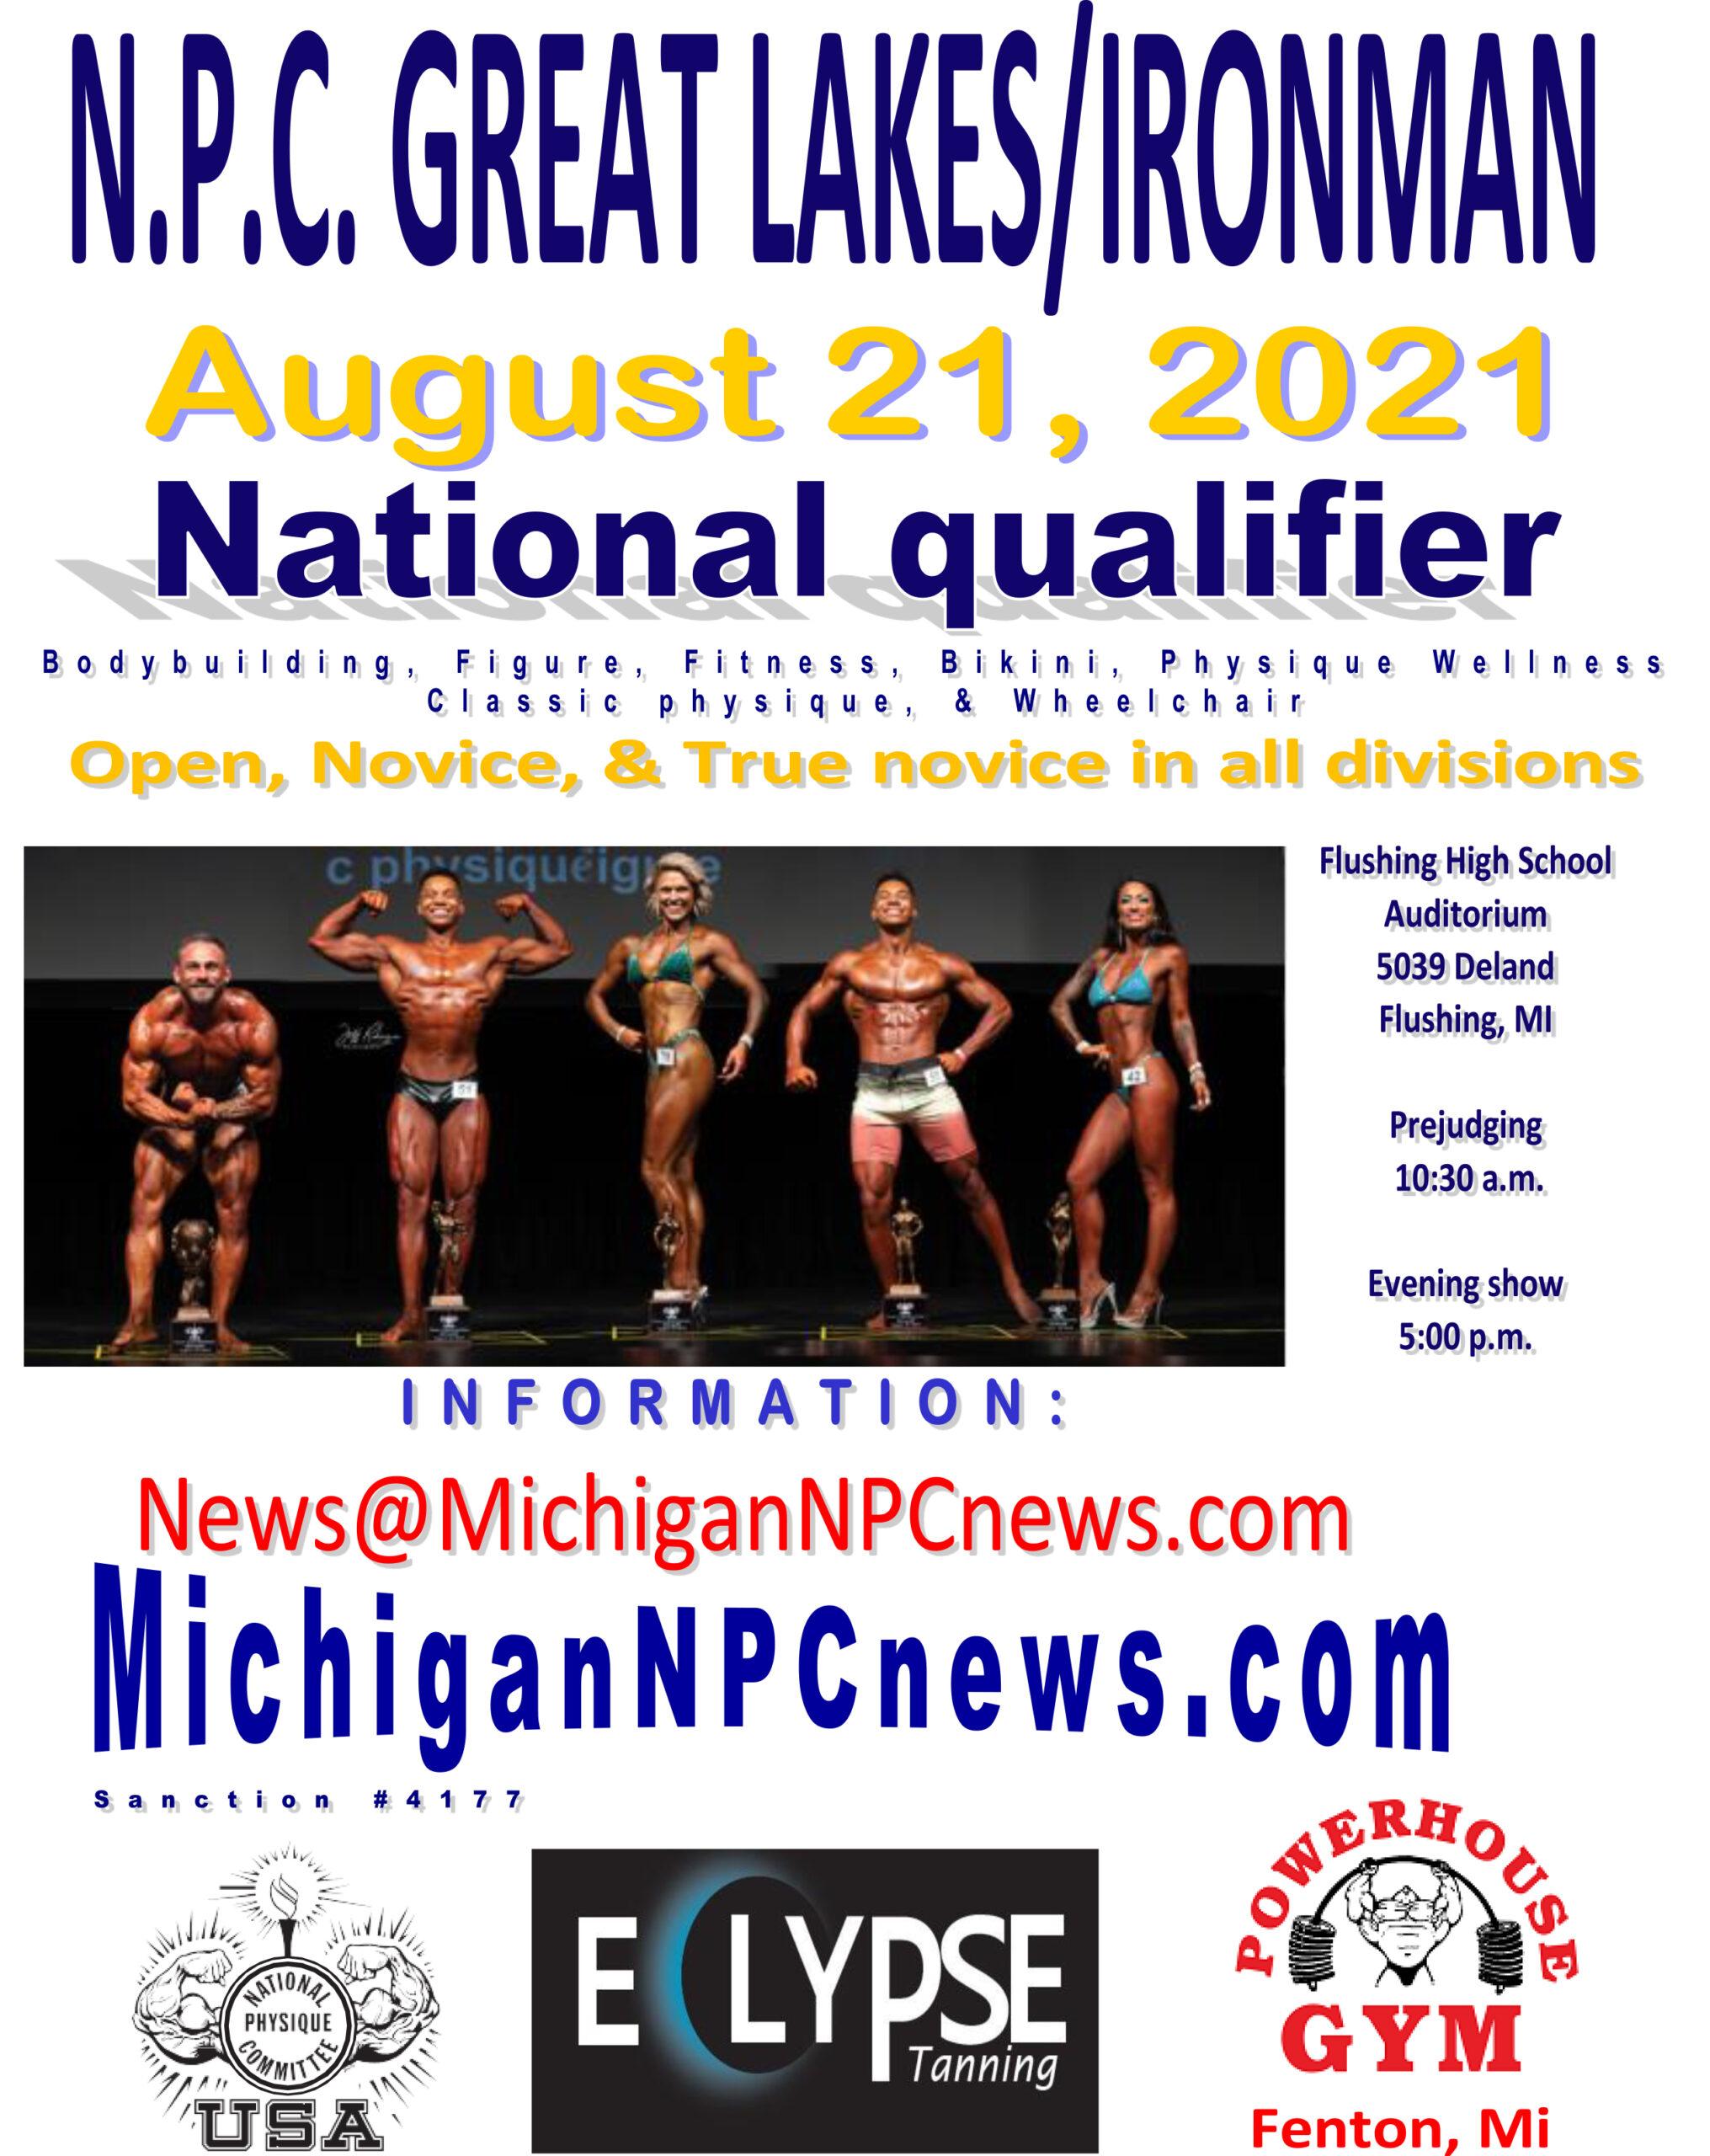 2021 NPC Great Lakes / Ironman Poster